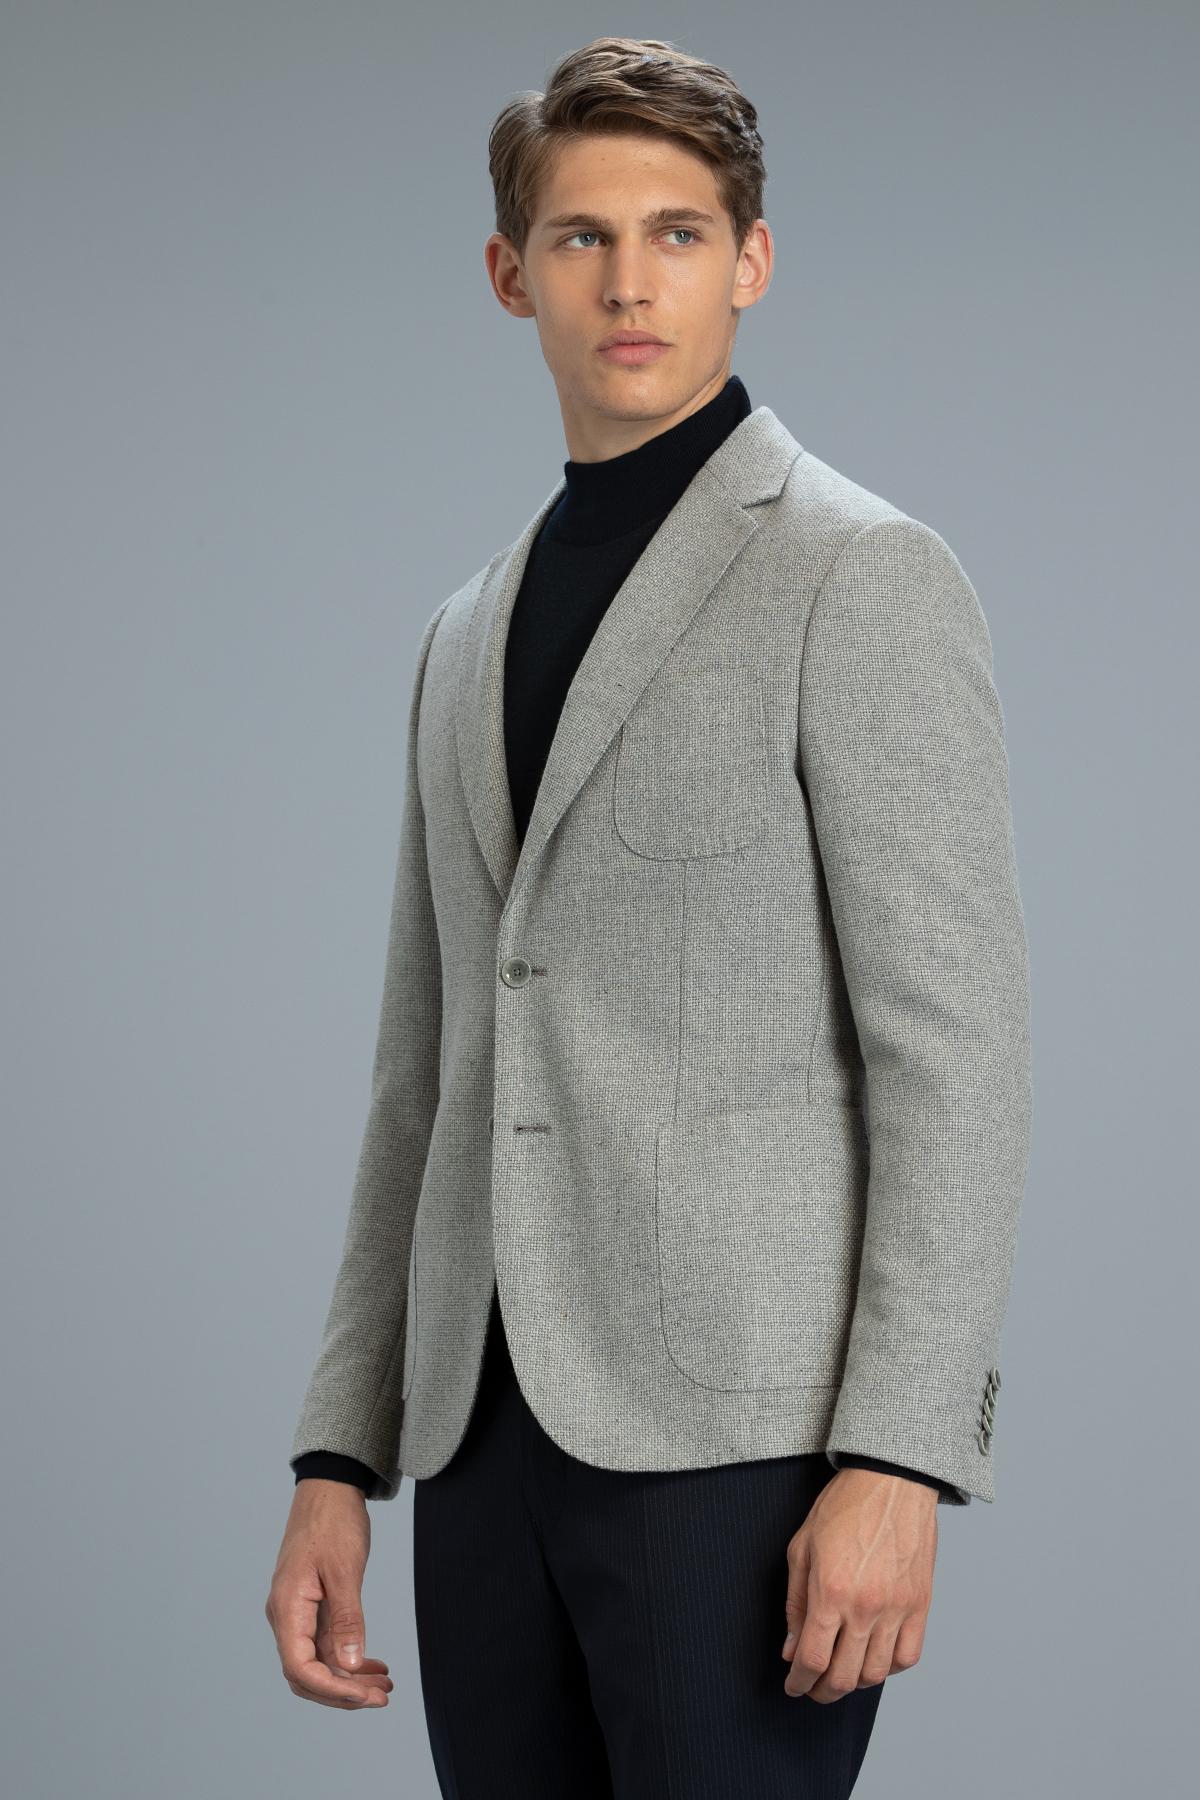 Erla Spor Blazer Ceket Slim Fit Gri